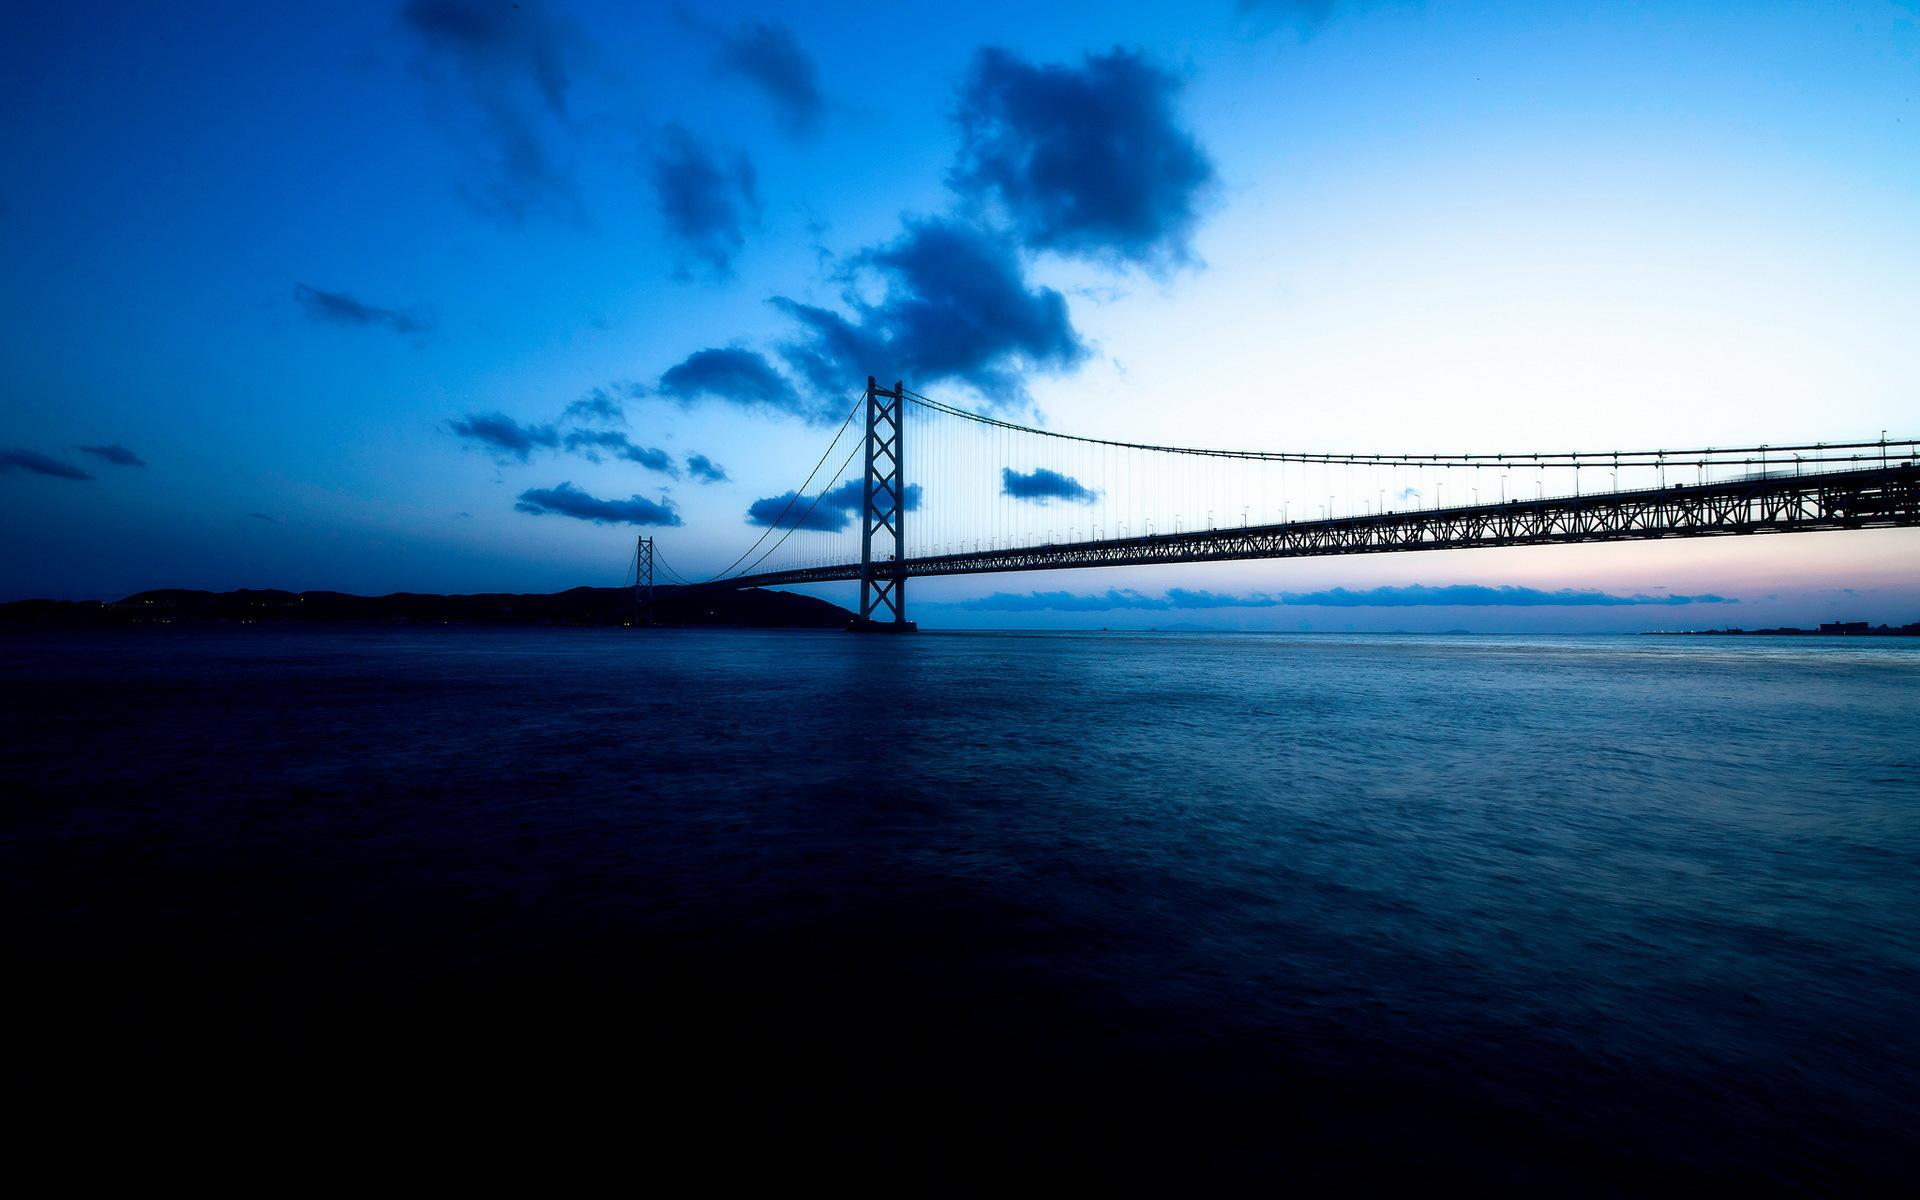 HD Wallpapers Pearl Bridge in Japan